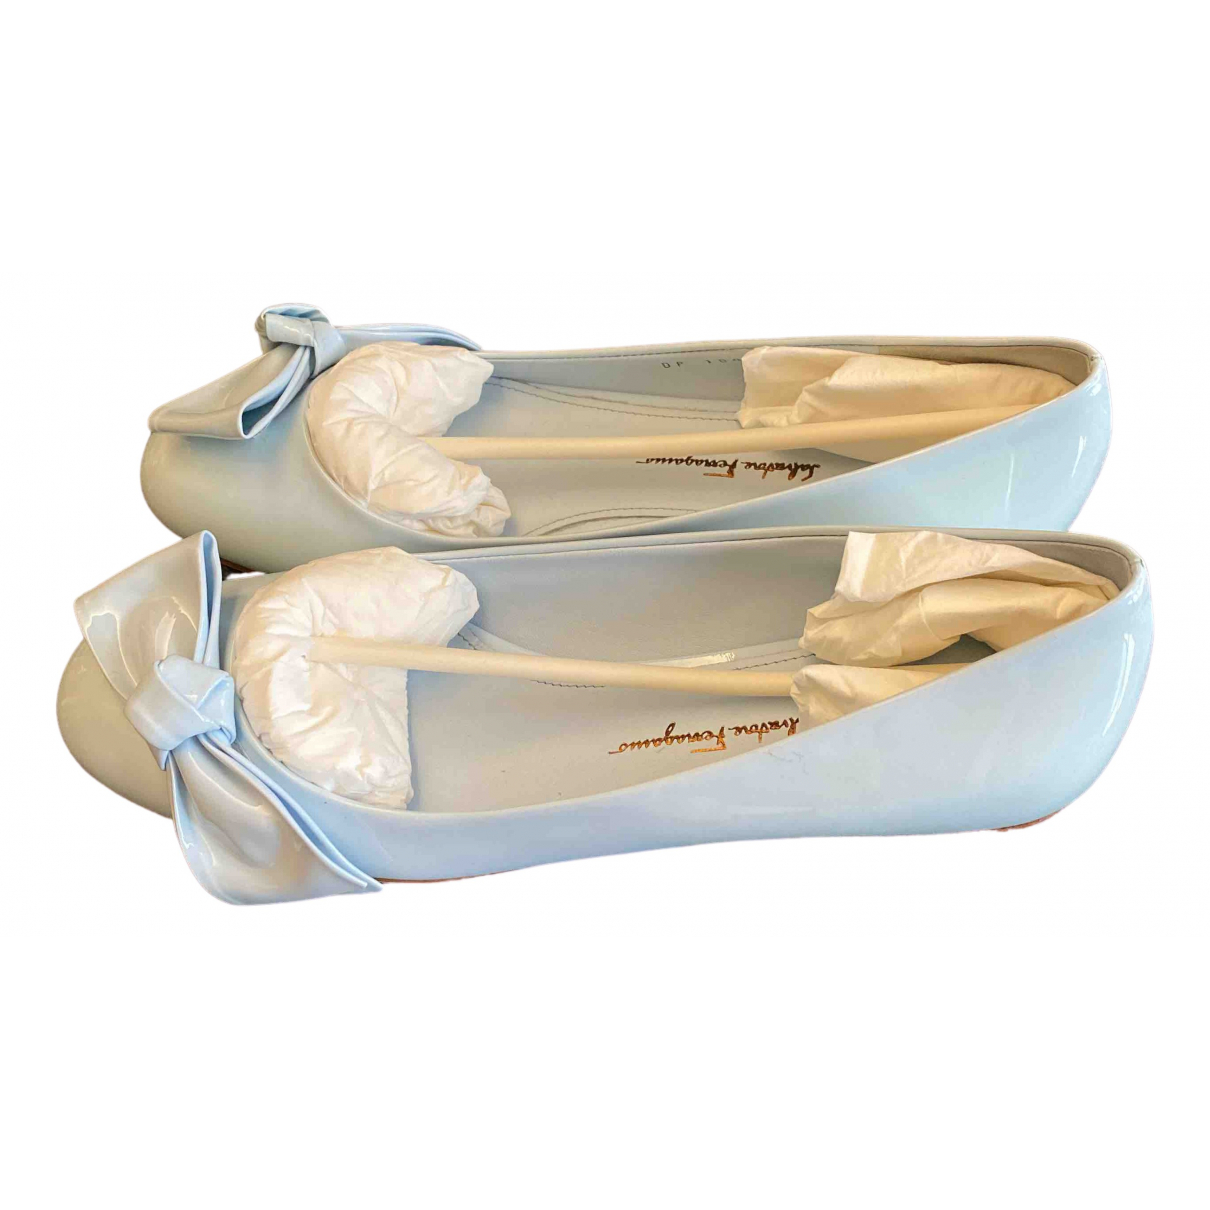 Salvatore Ferragamo \N Blue Patent leather Ballet flats for Women 7 US